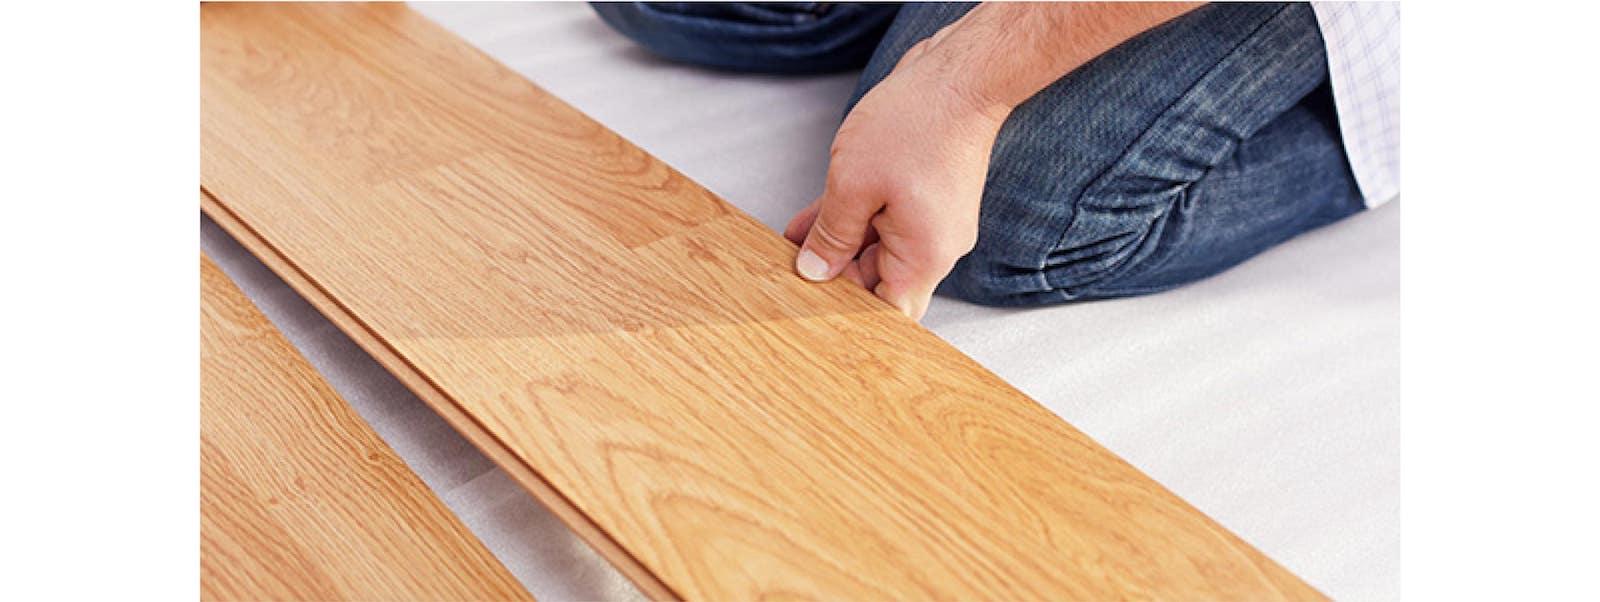 wood boards installing